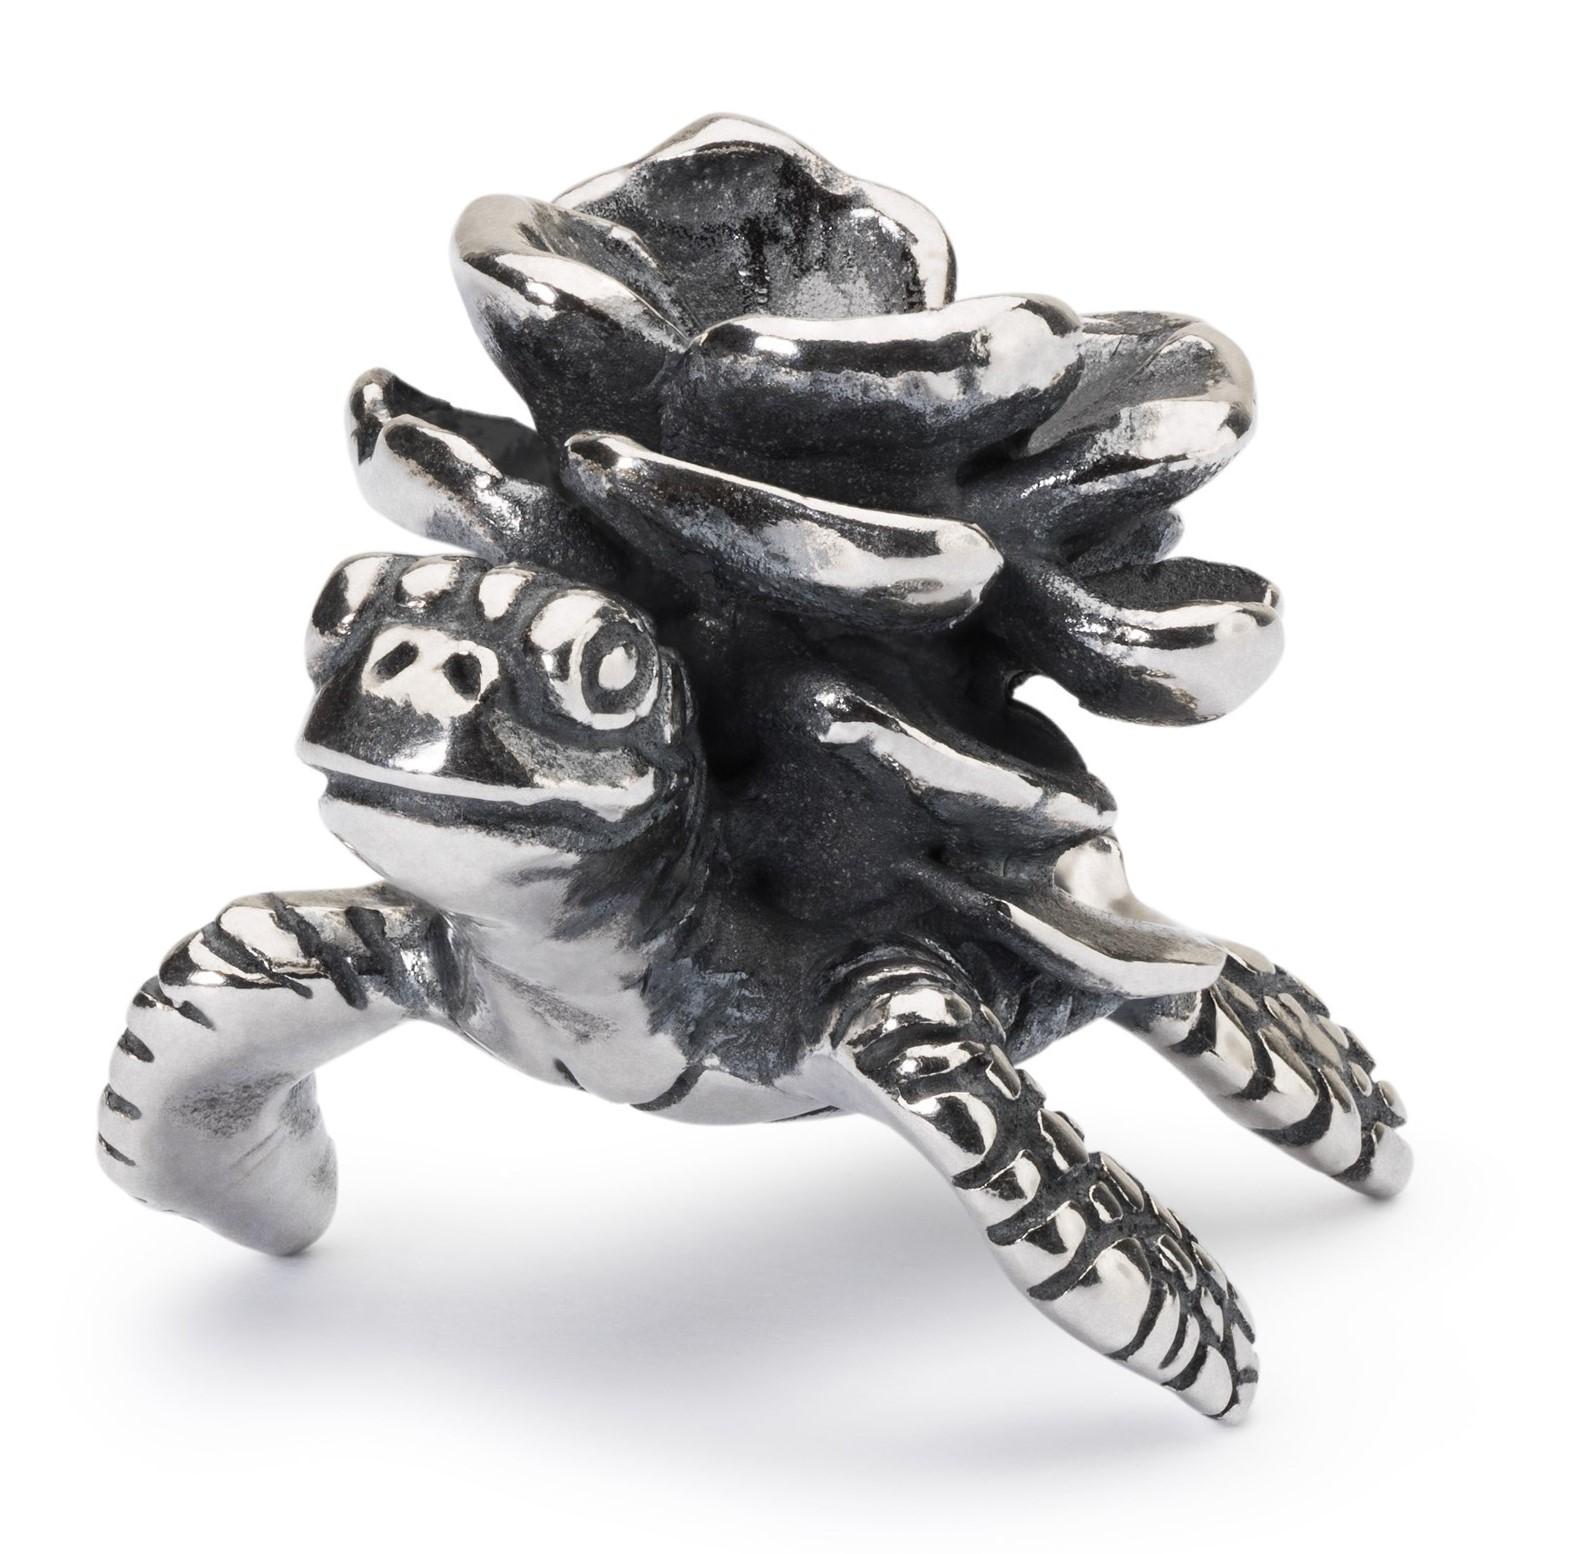 NEU !! Original Trollbeads Silber Bead Wächter des Schatzes TAGBE-20074 !